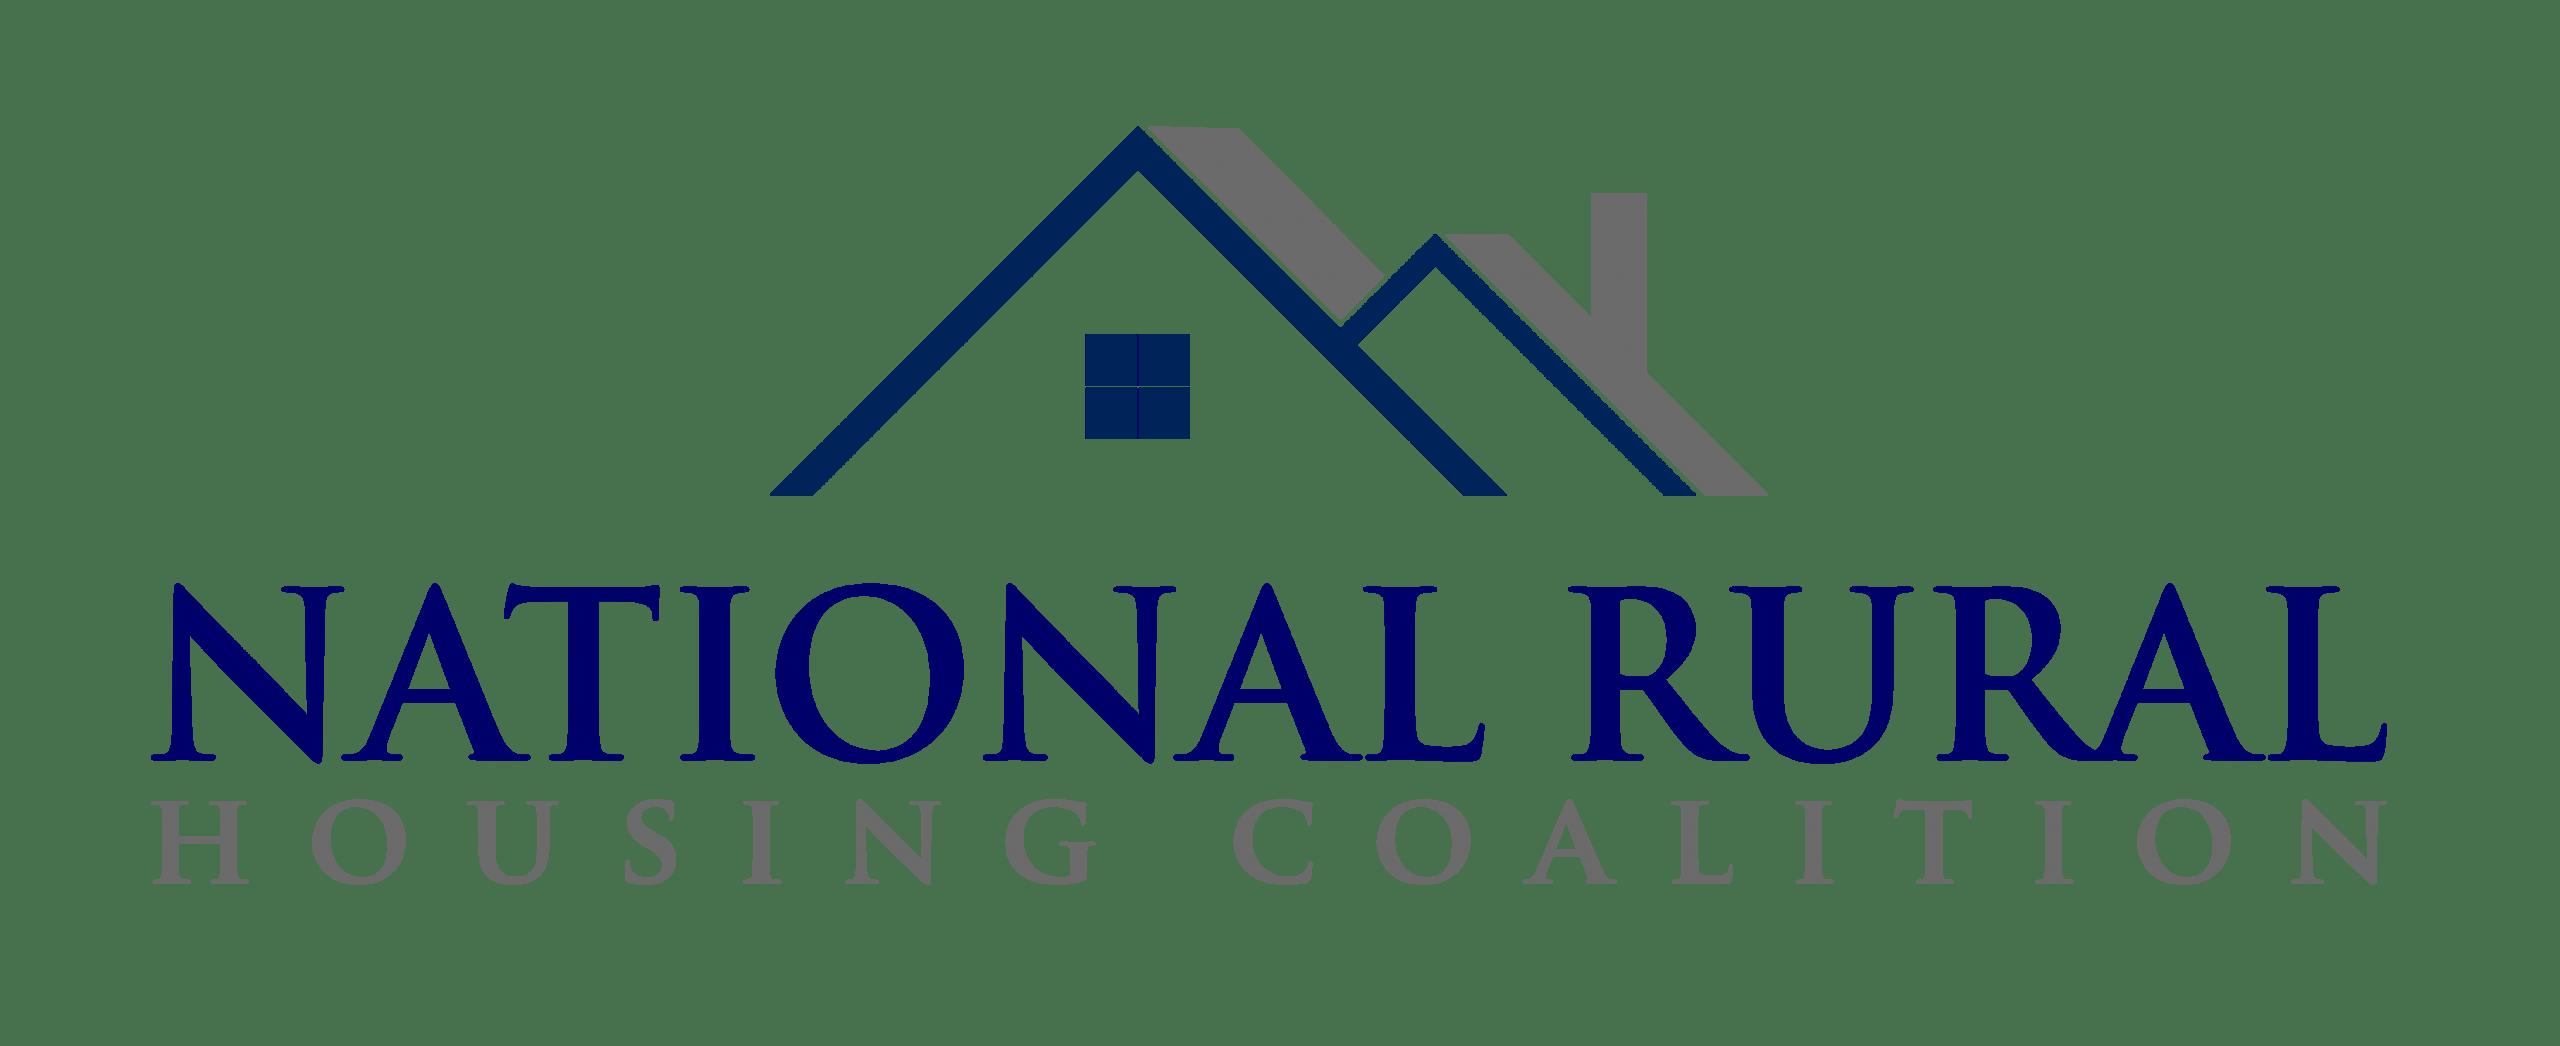 National Rural Housing Coalition